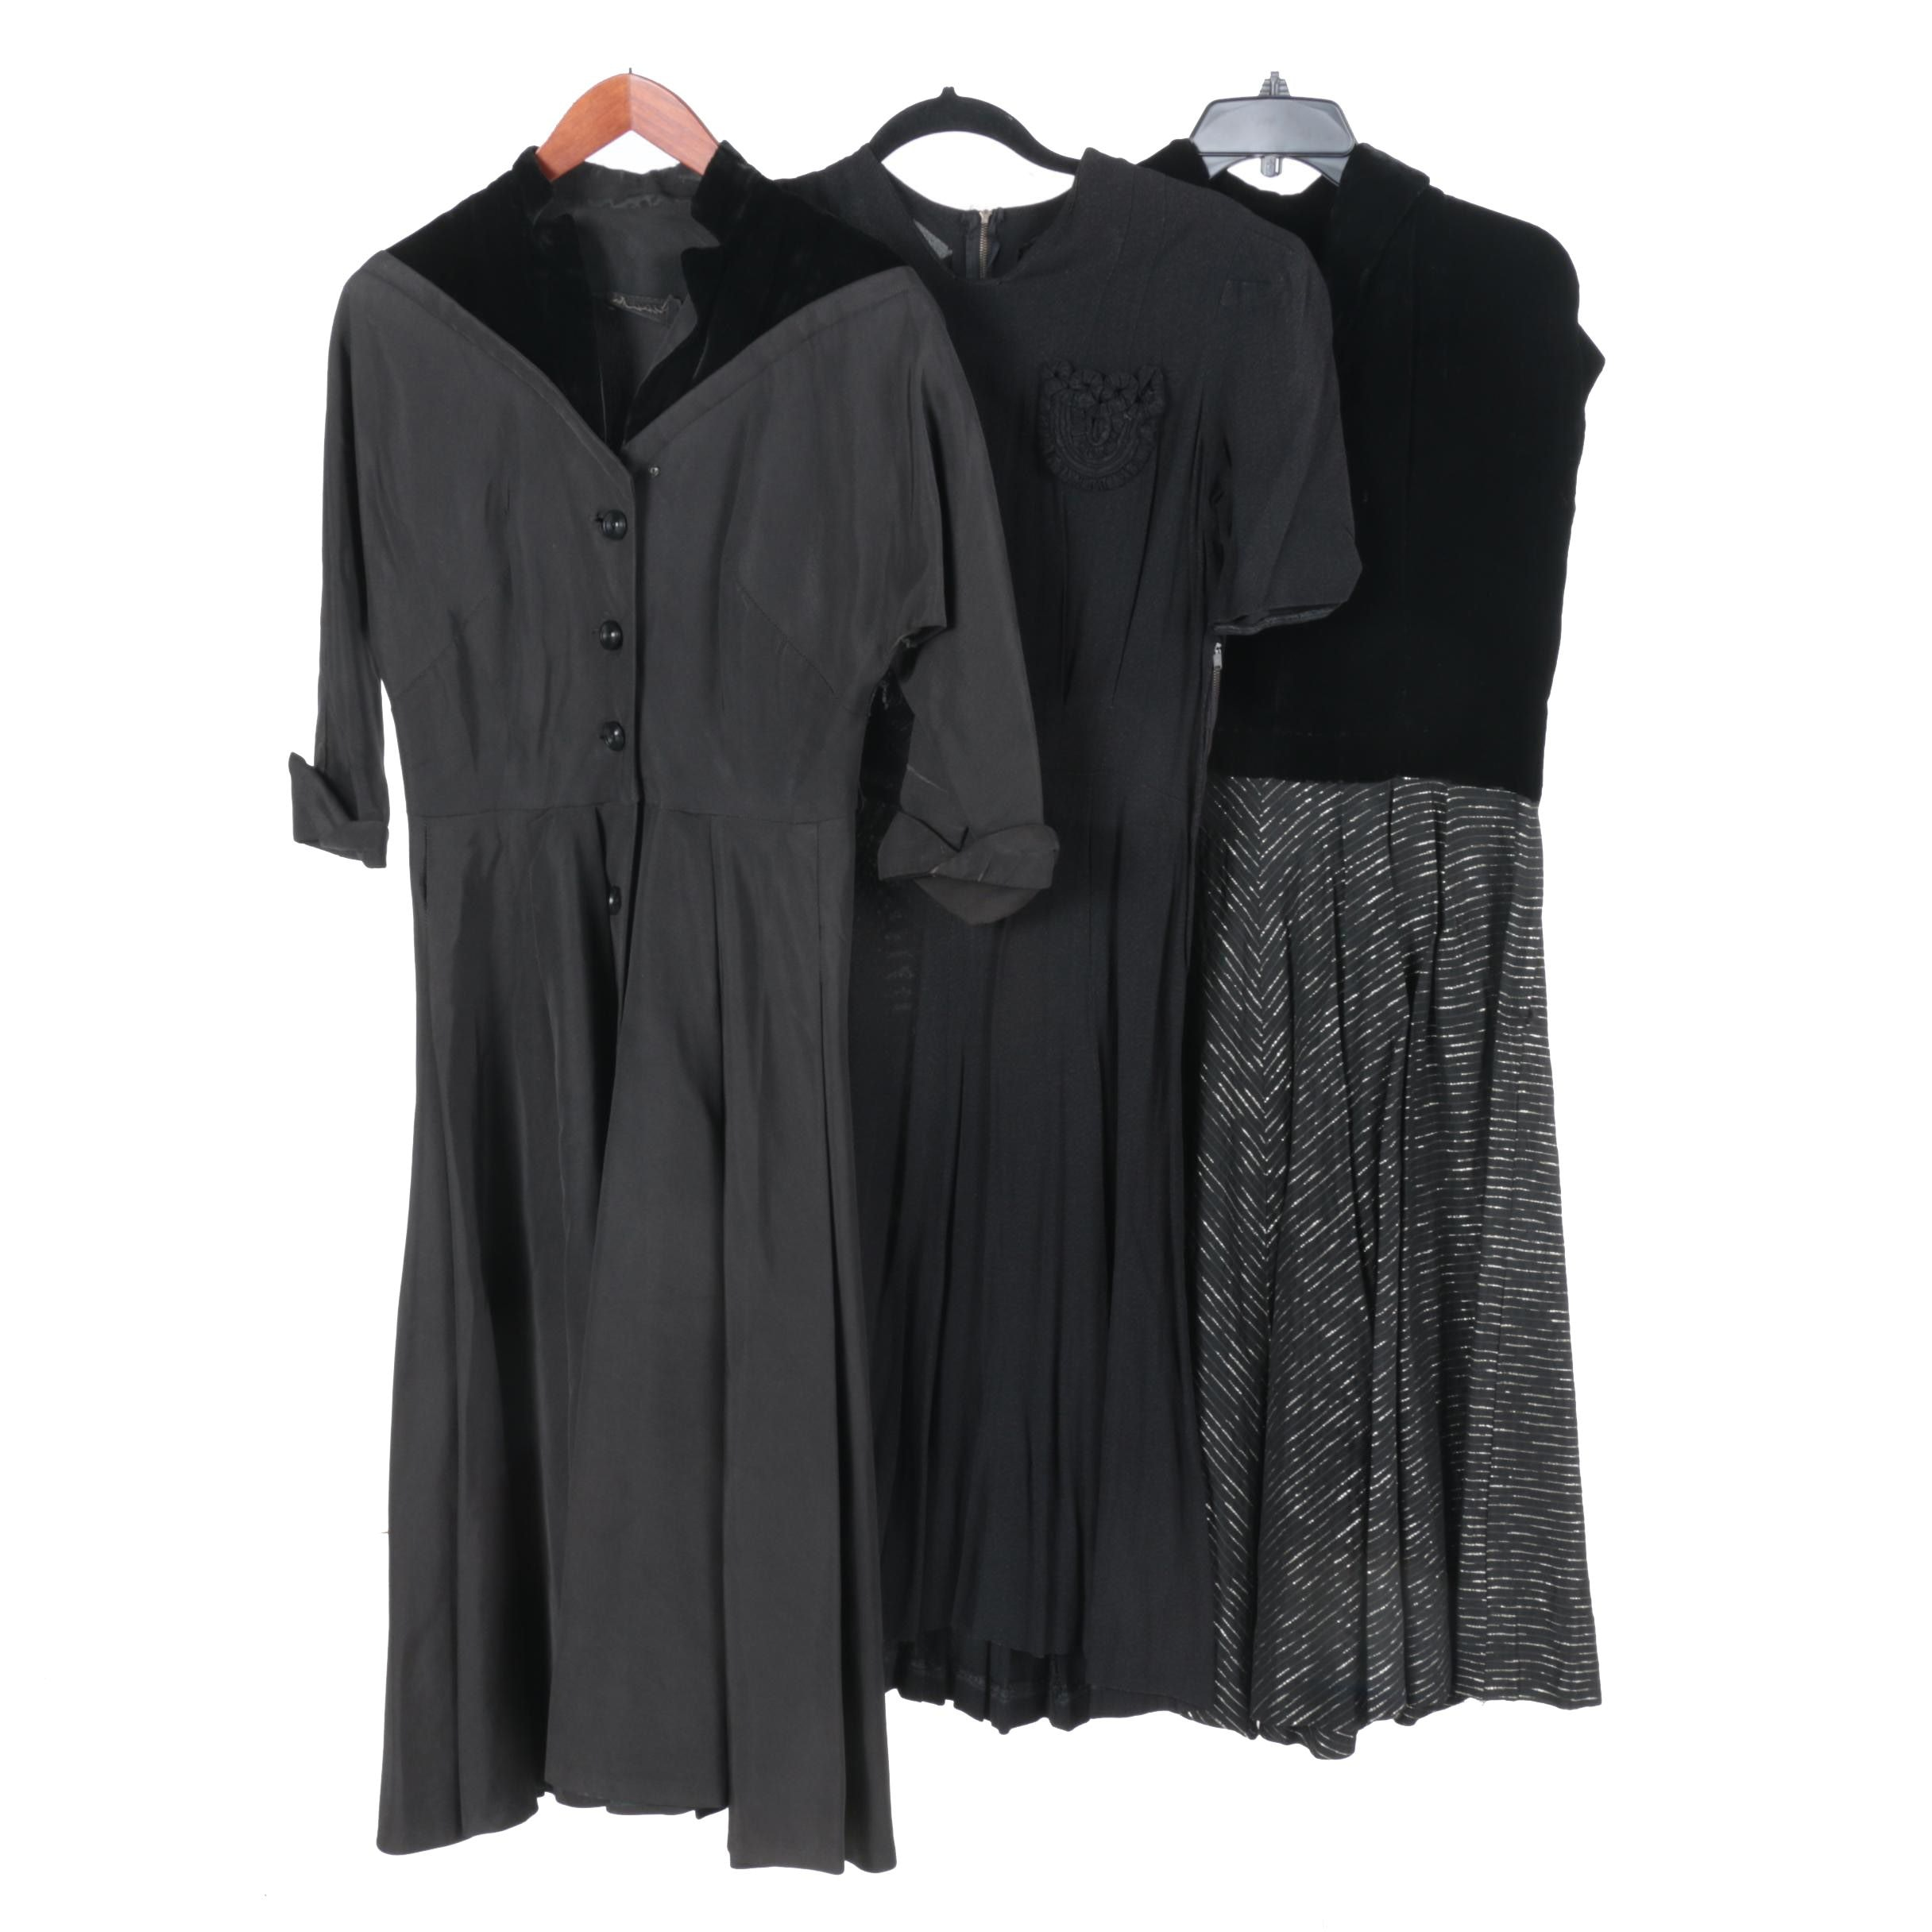 Mid Century Black Ladies' Dresses